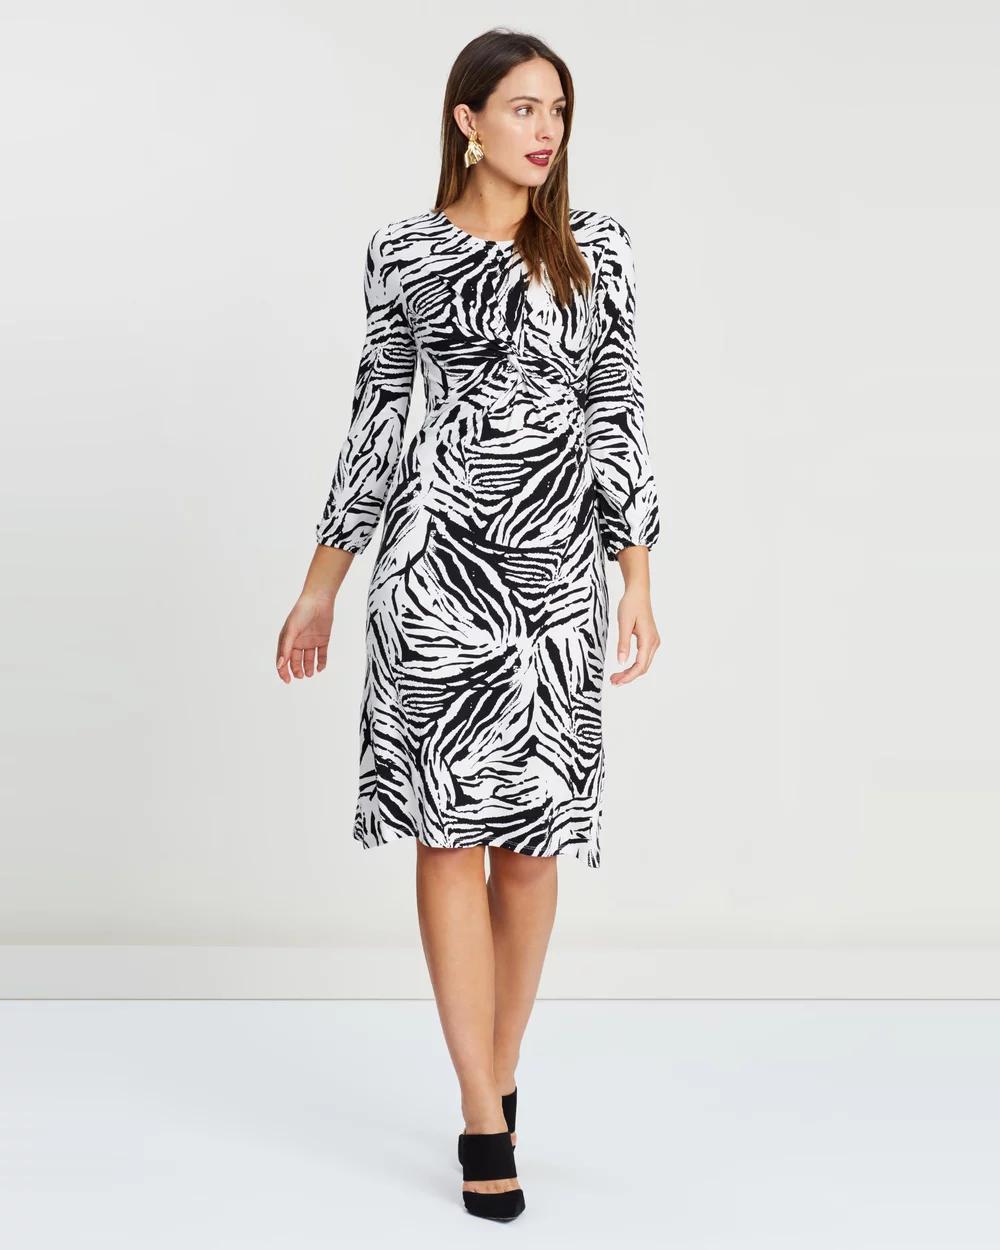 Zebra Manipulated Midi Dress By Dorothy Perkins Online The Iconic Australia Women Dress Online Dresses Online Australia Dresses